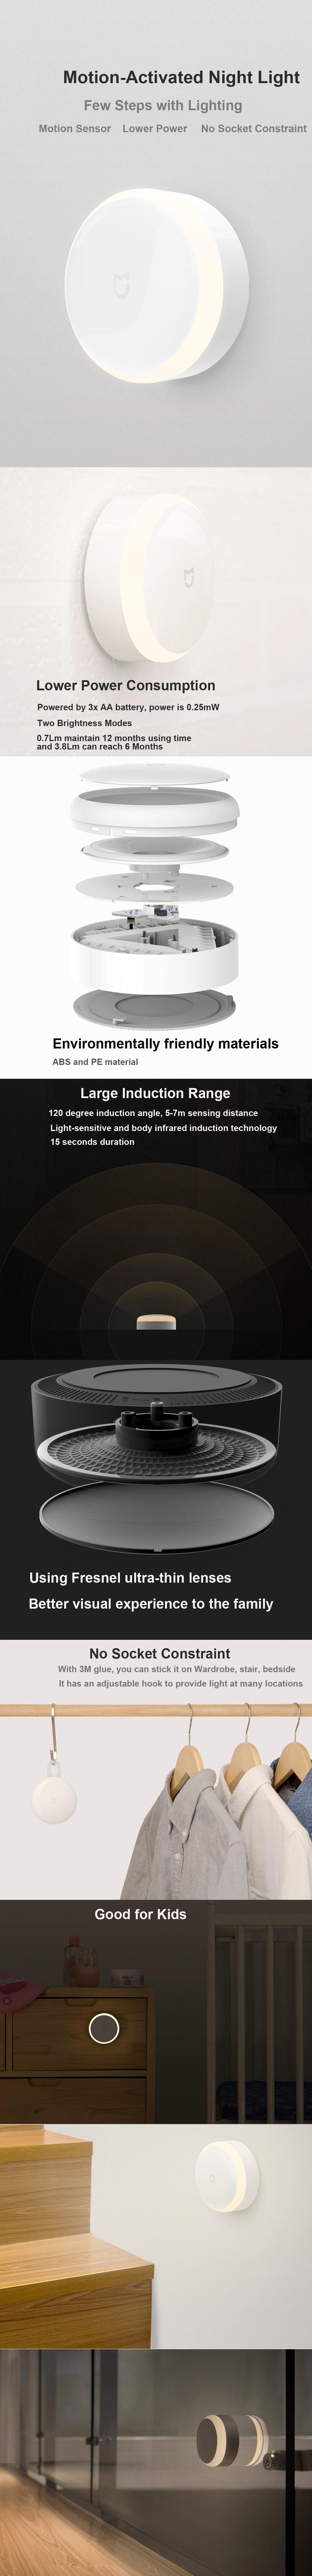 Xiaomi Mijia Motion Activated Sensor Night Light